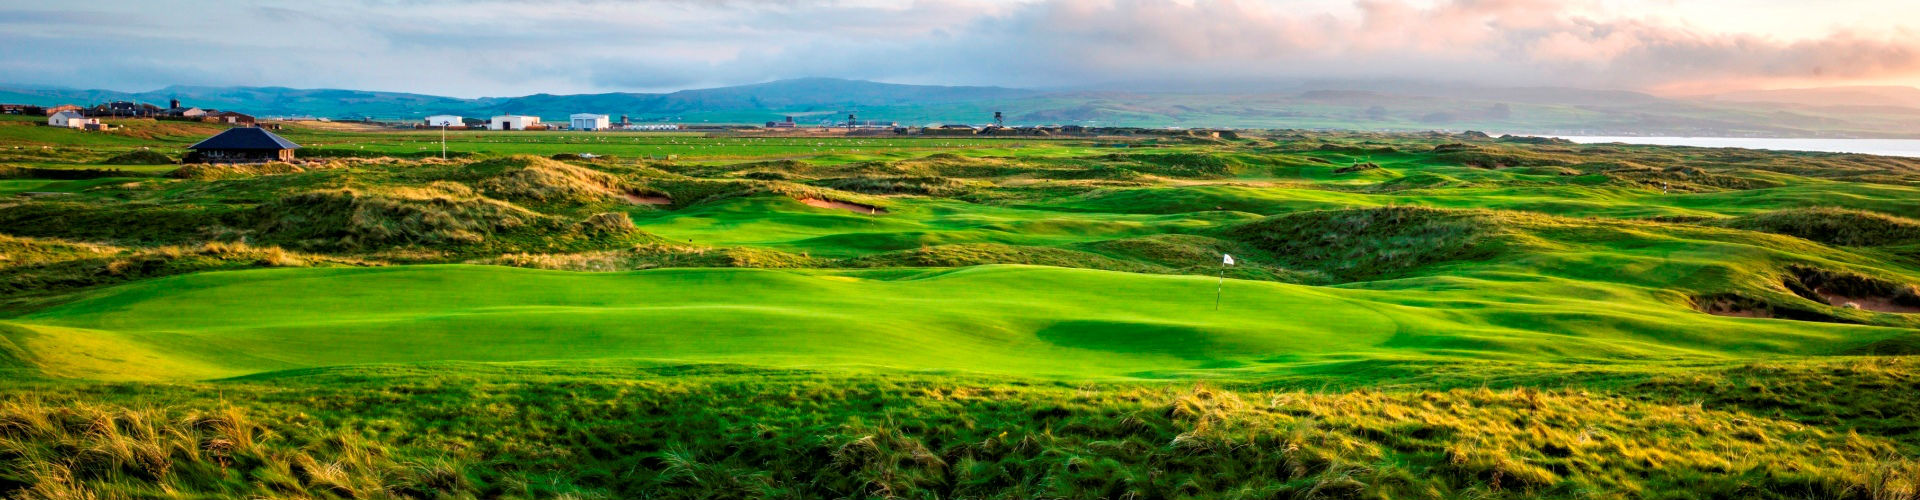 Golfresor England - golfreseguiden.se